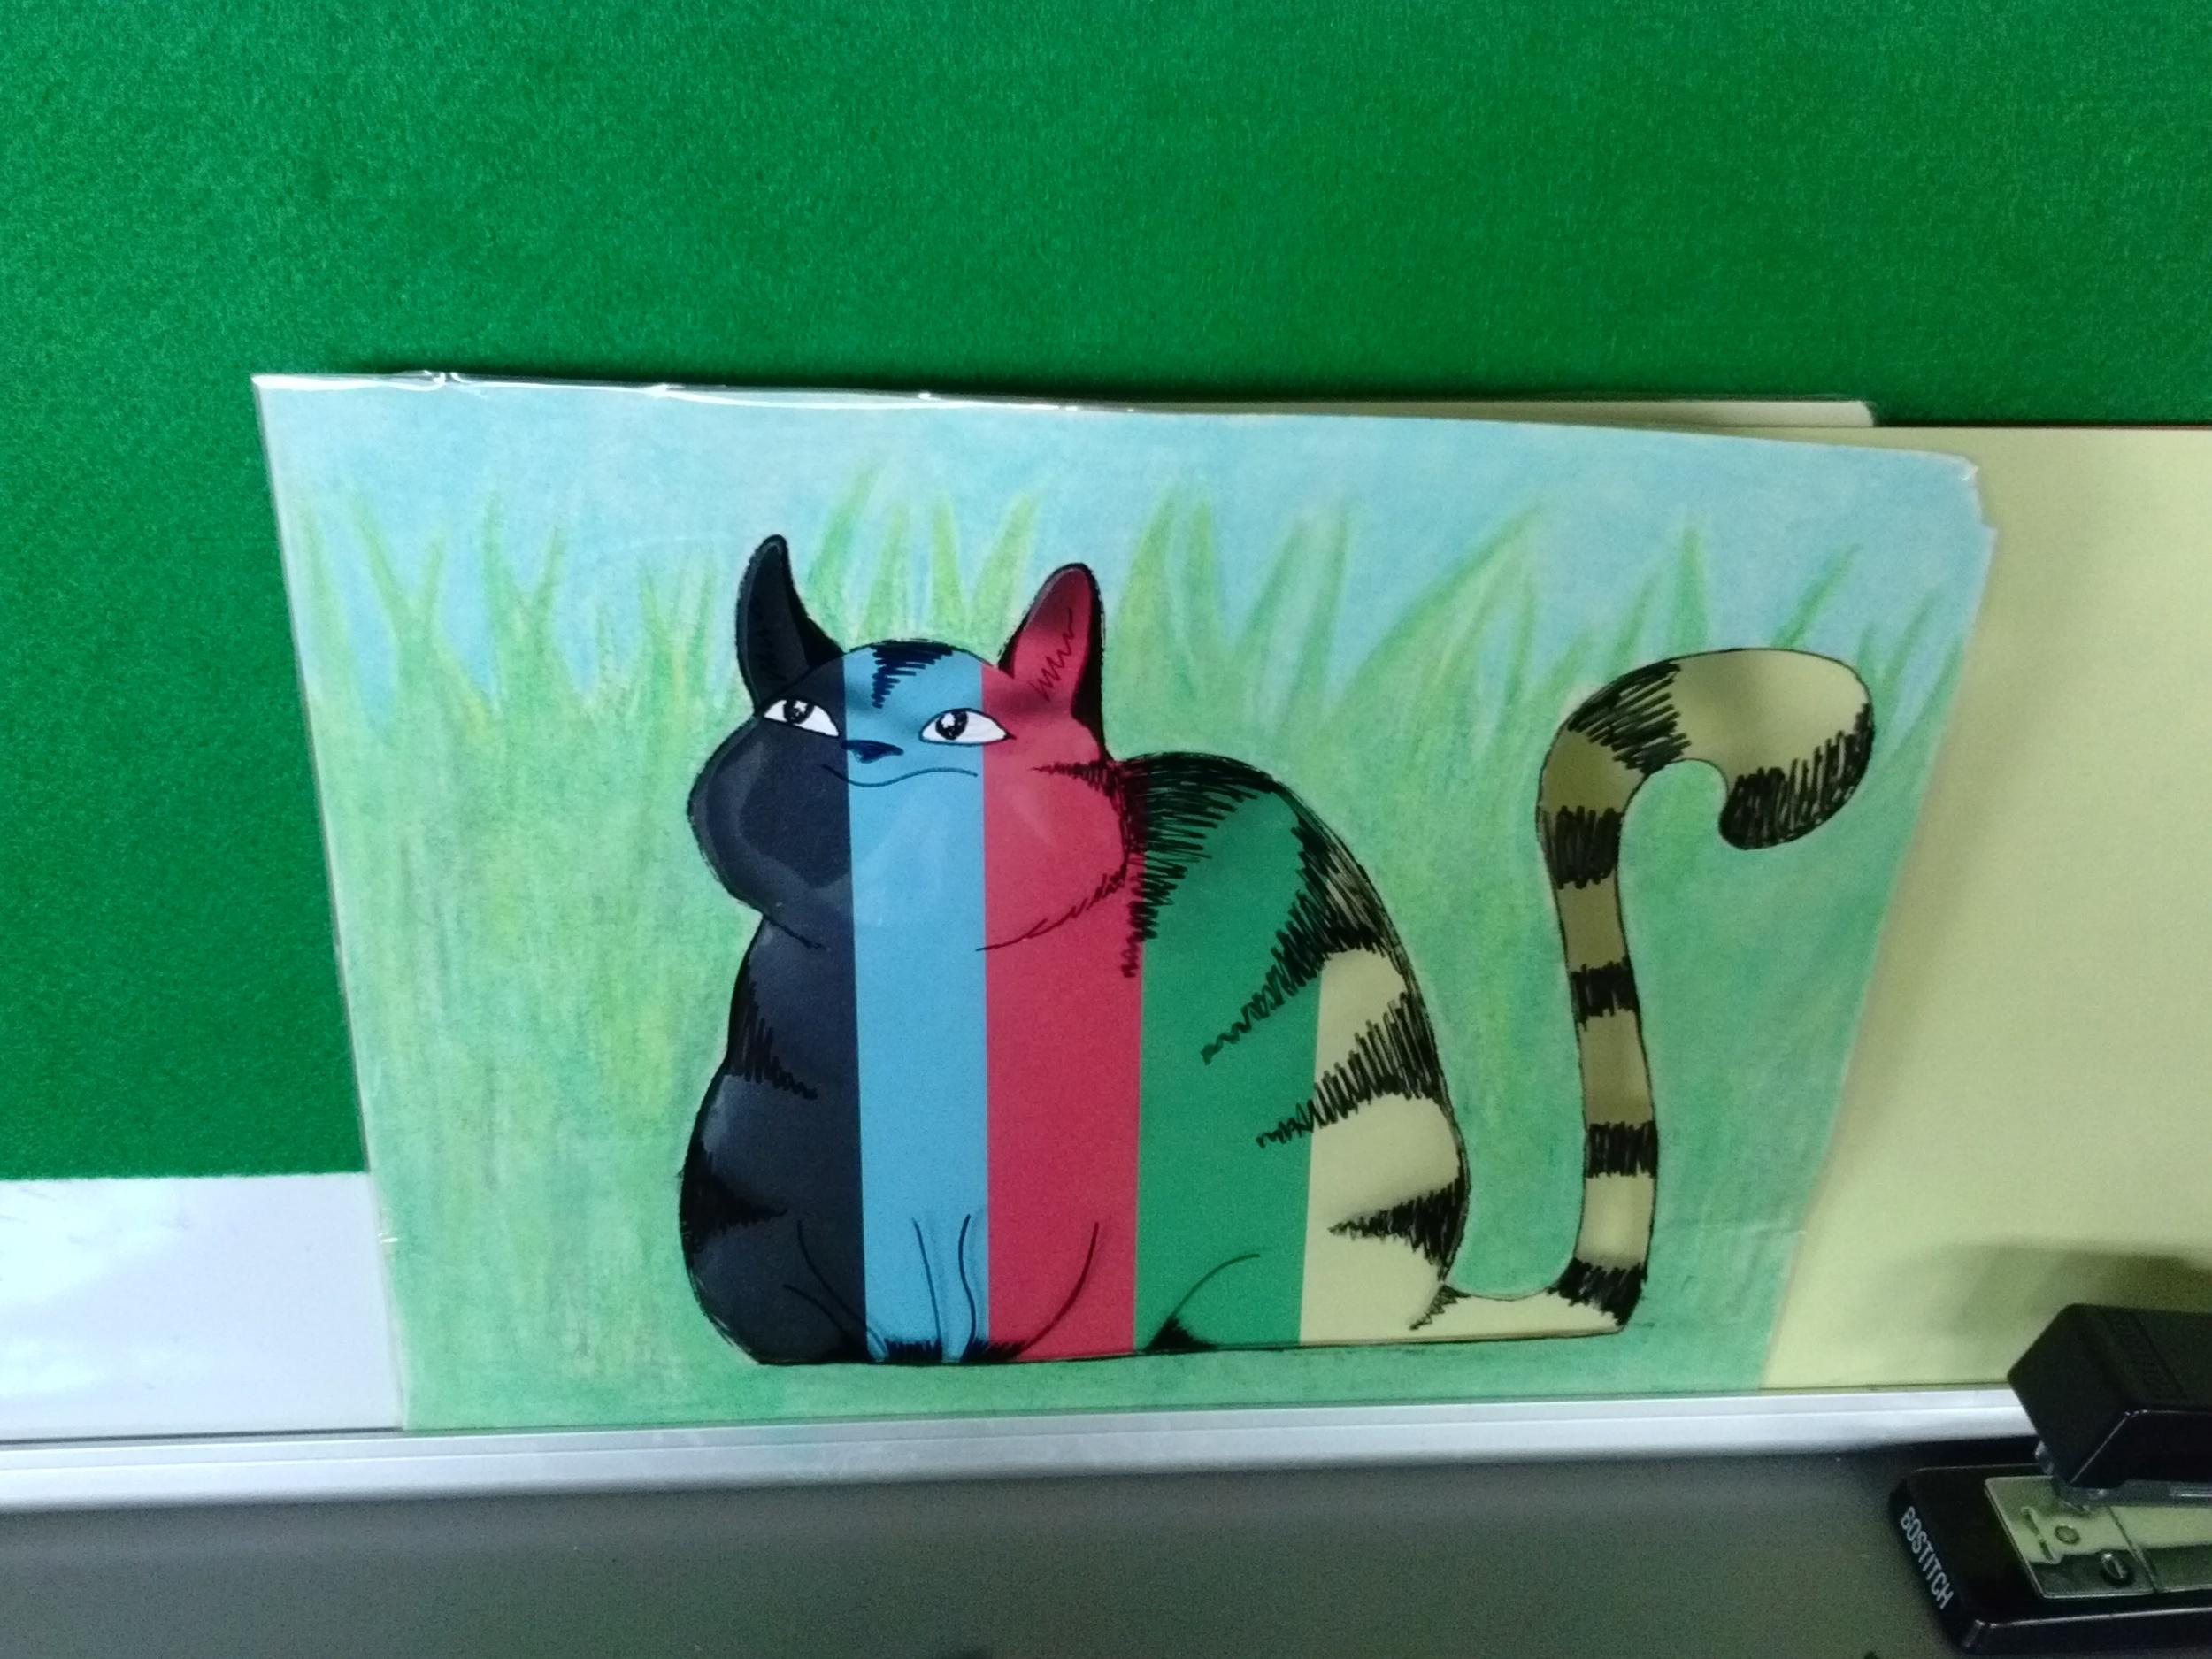 Scat the Cat - Folder Story